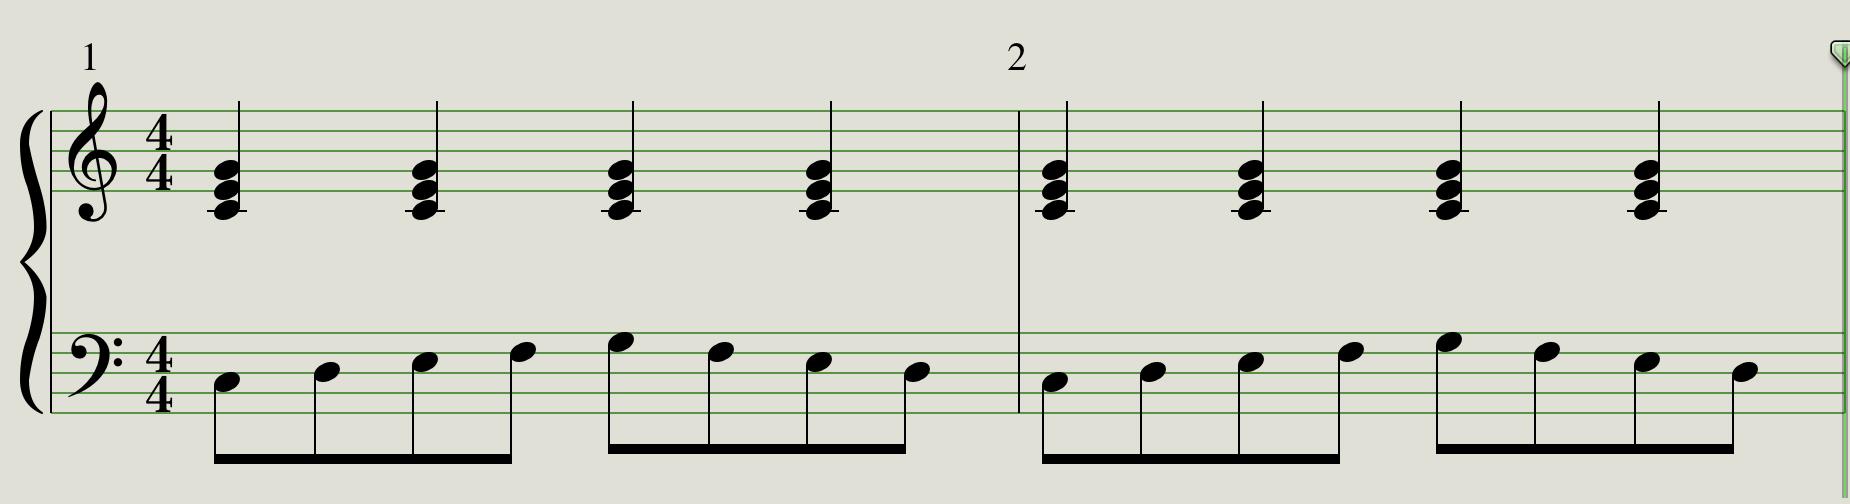 Hands Coordination [PSH] - Piano University